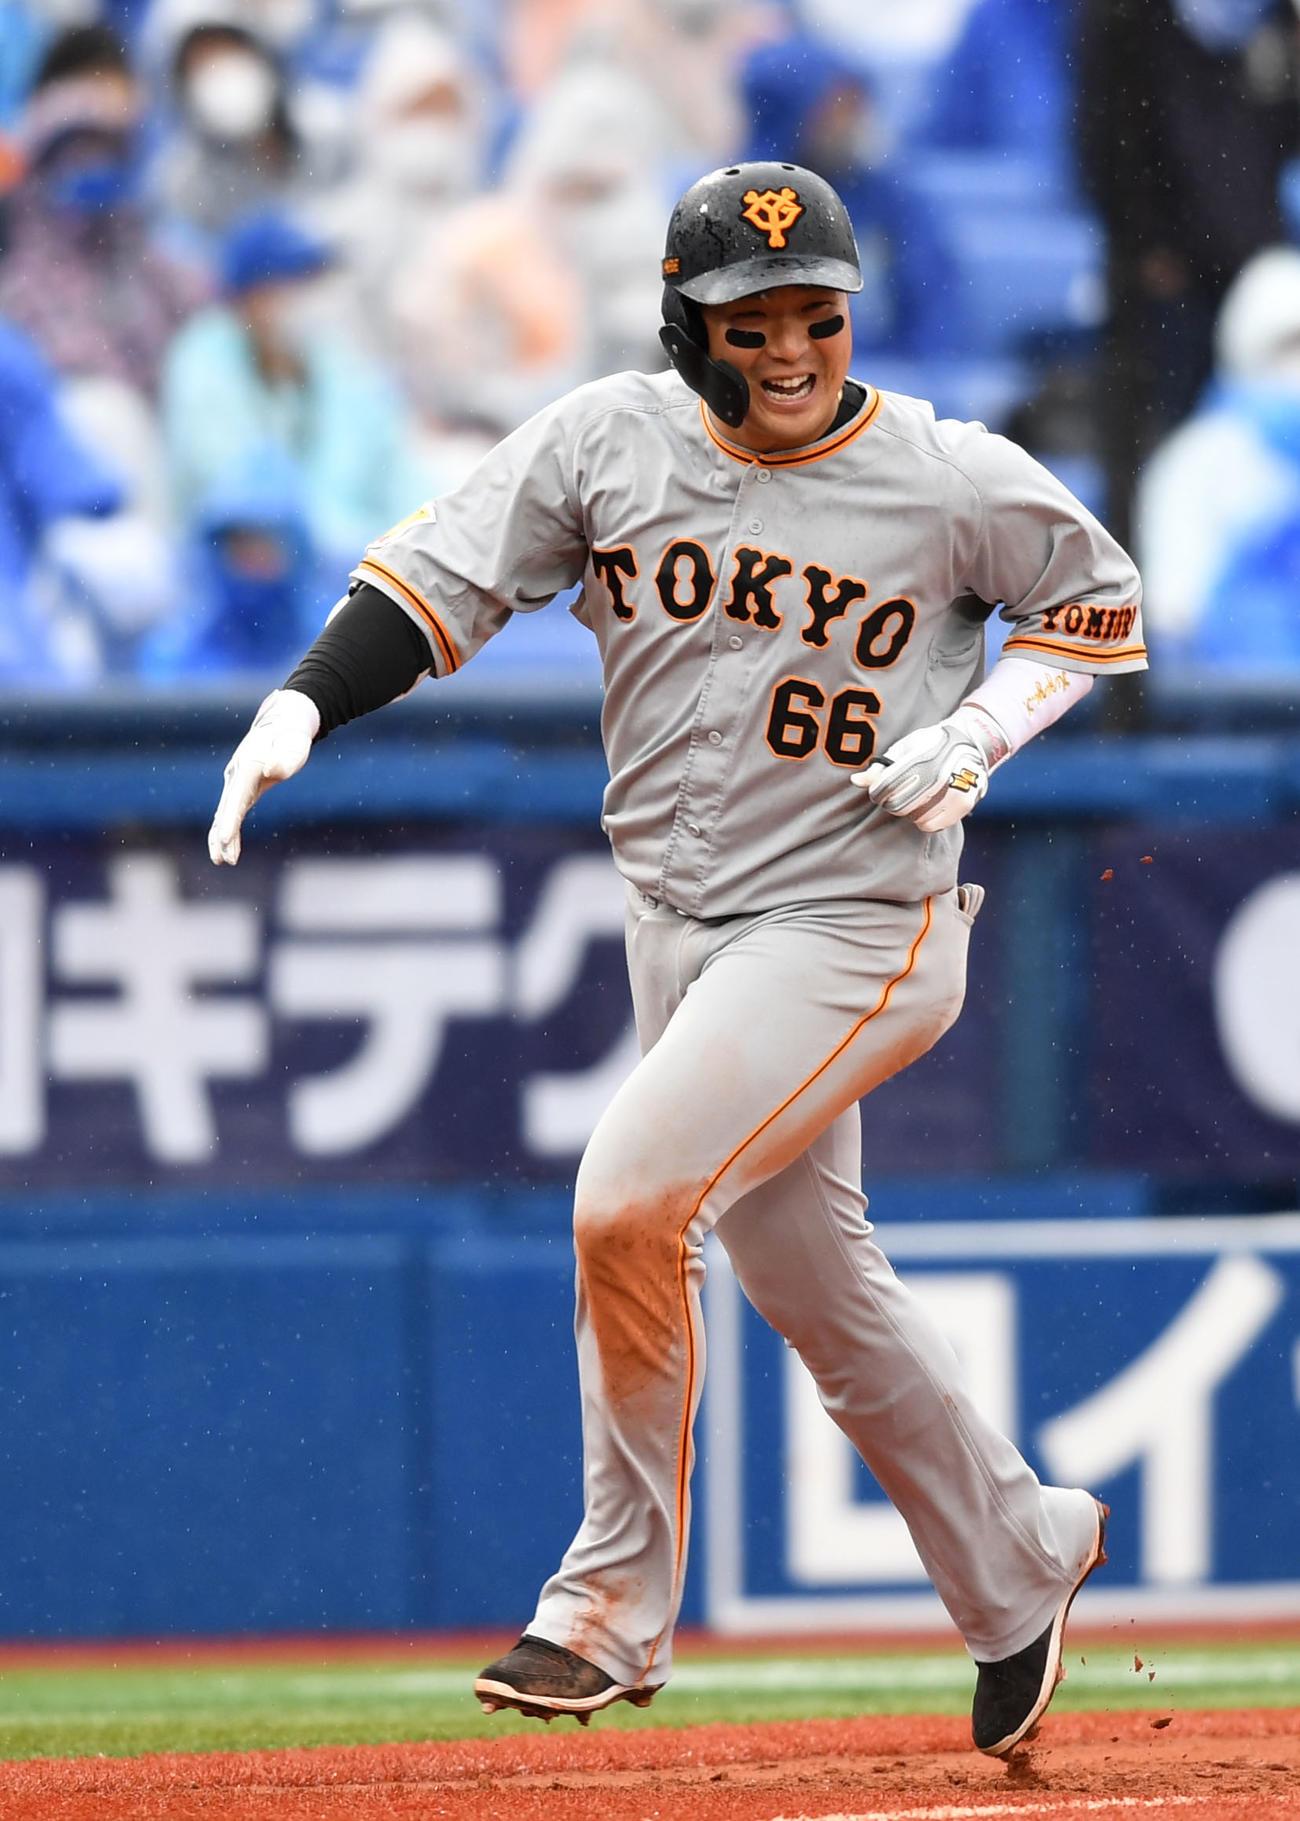 DeNA対巨人 6回表巨人2死一、三塁、右越え3点本塁打を放ち笑顔を見せる香月(撮影・横山健太)